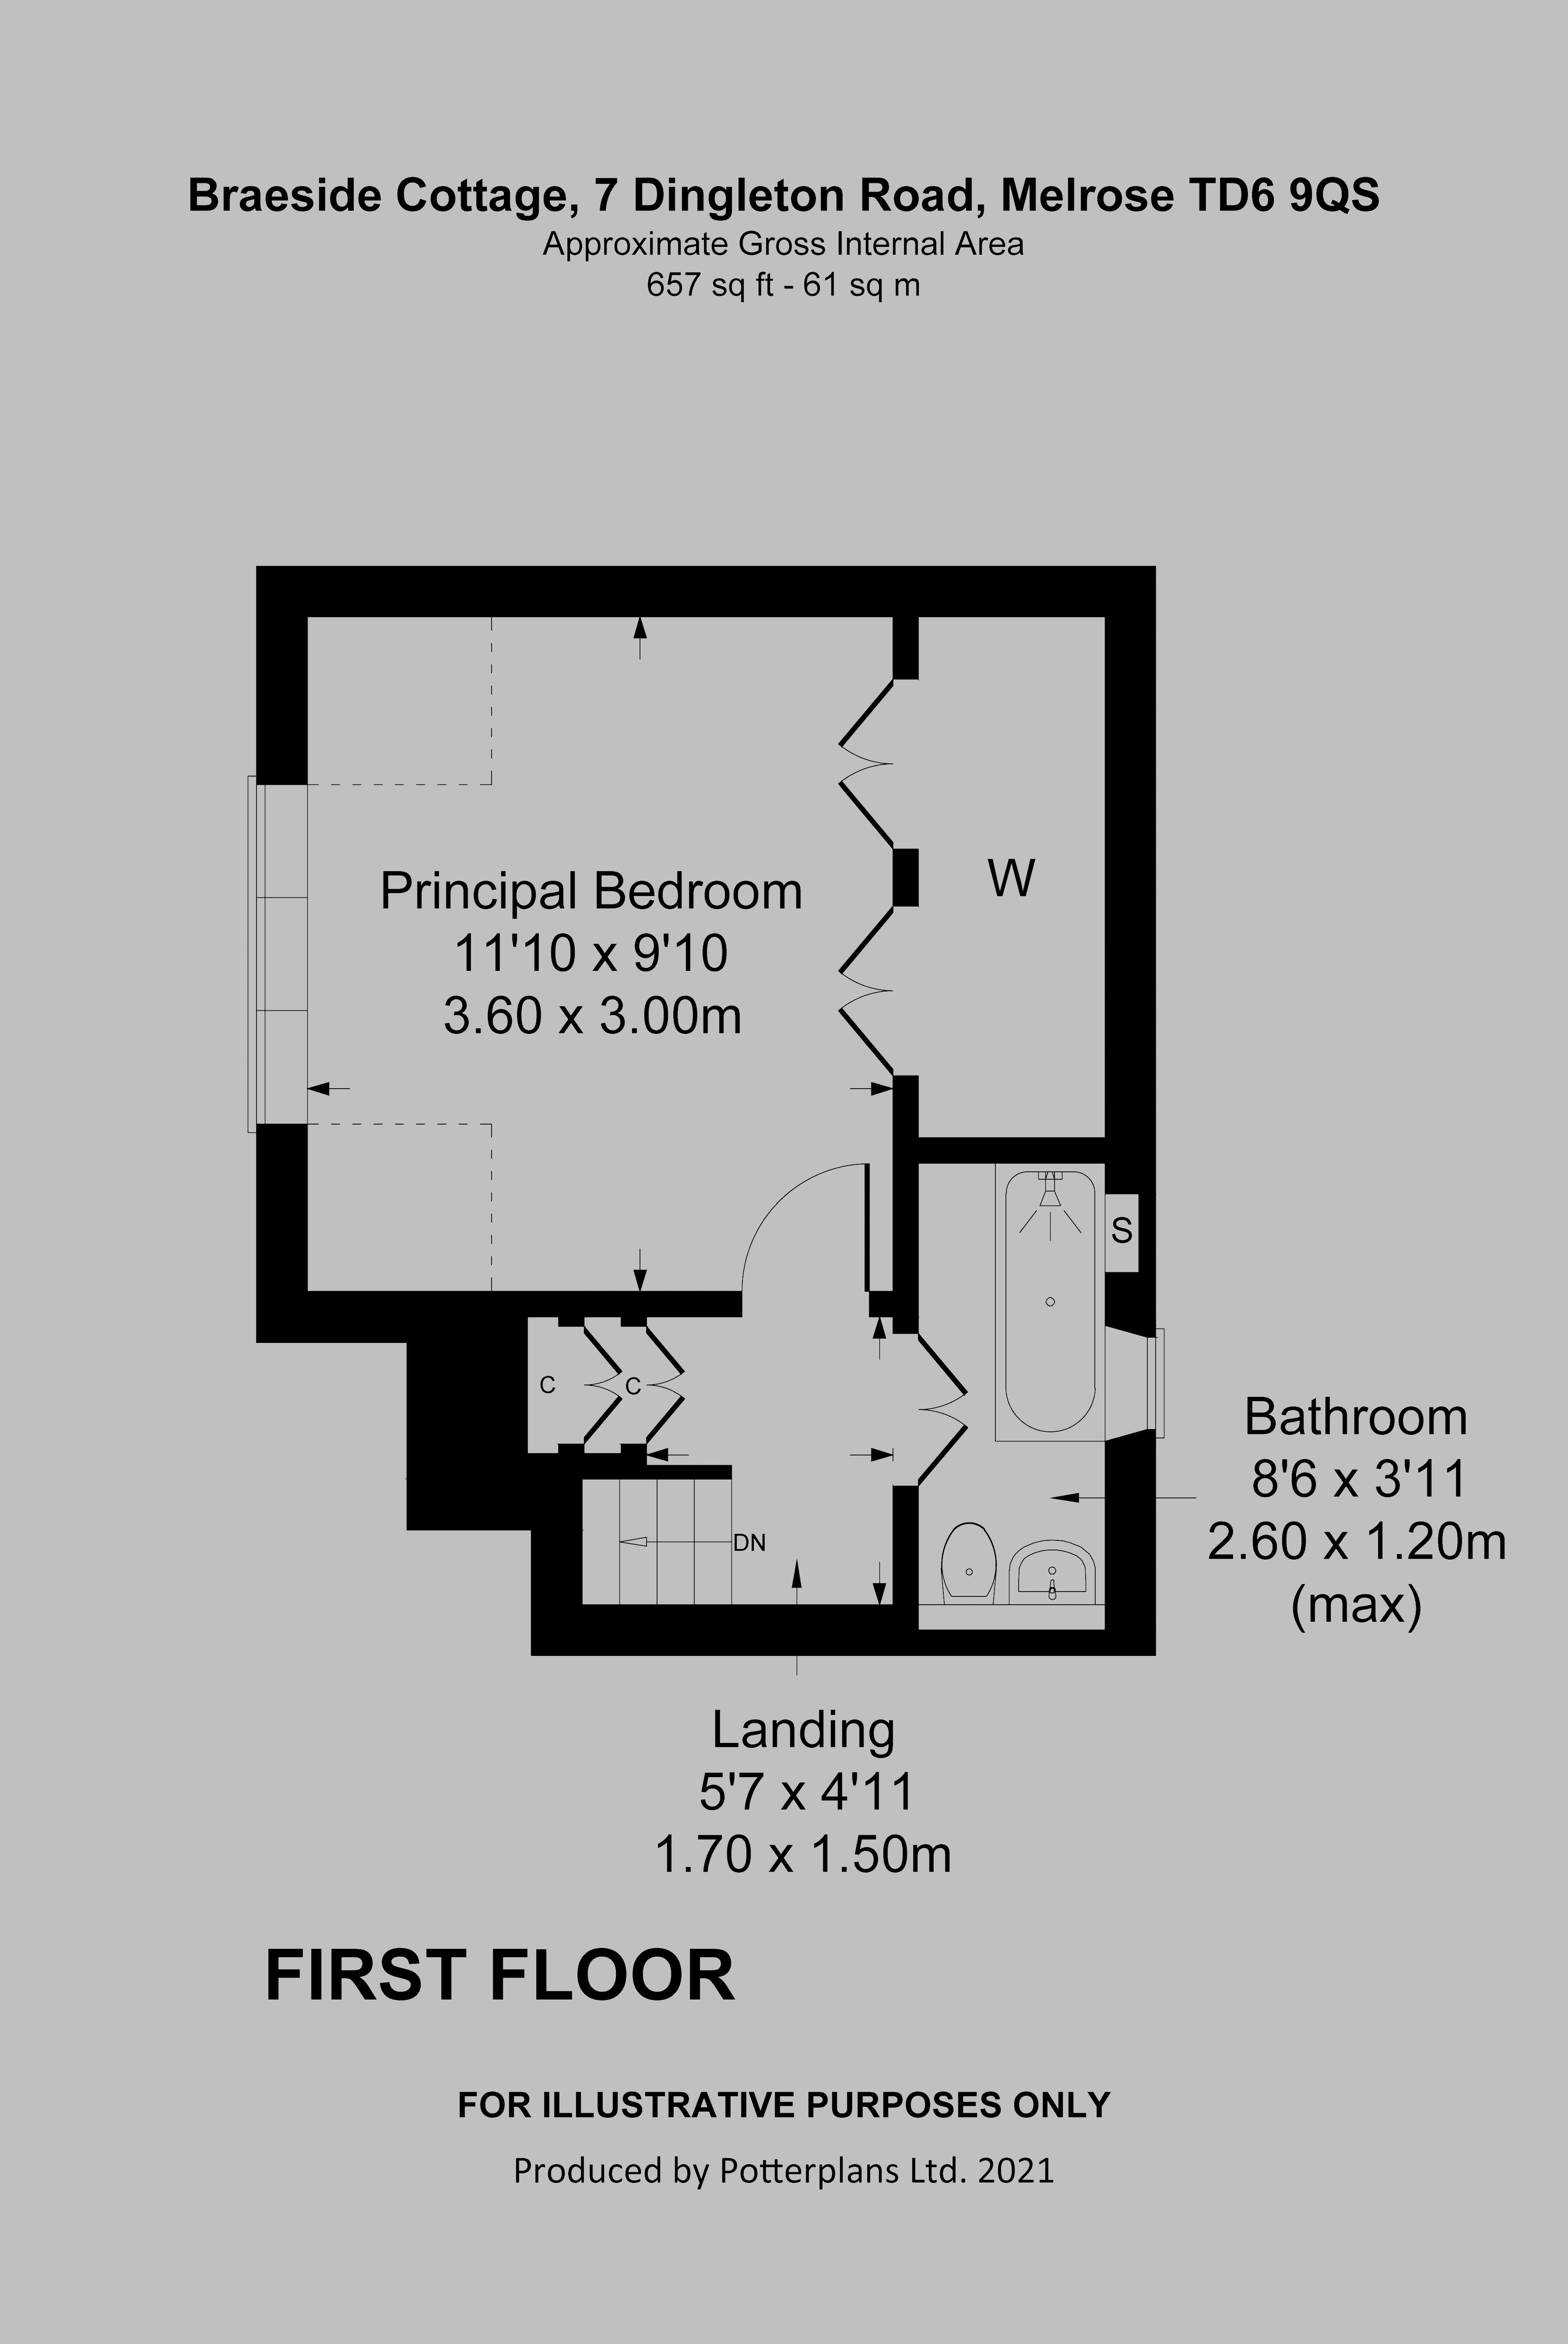 Braeside Cottage First Floor